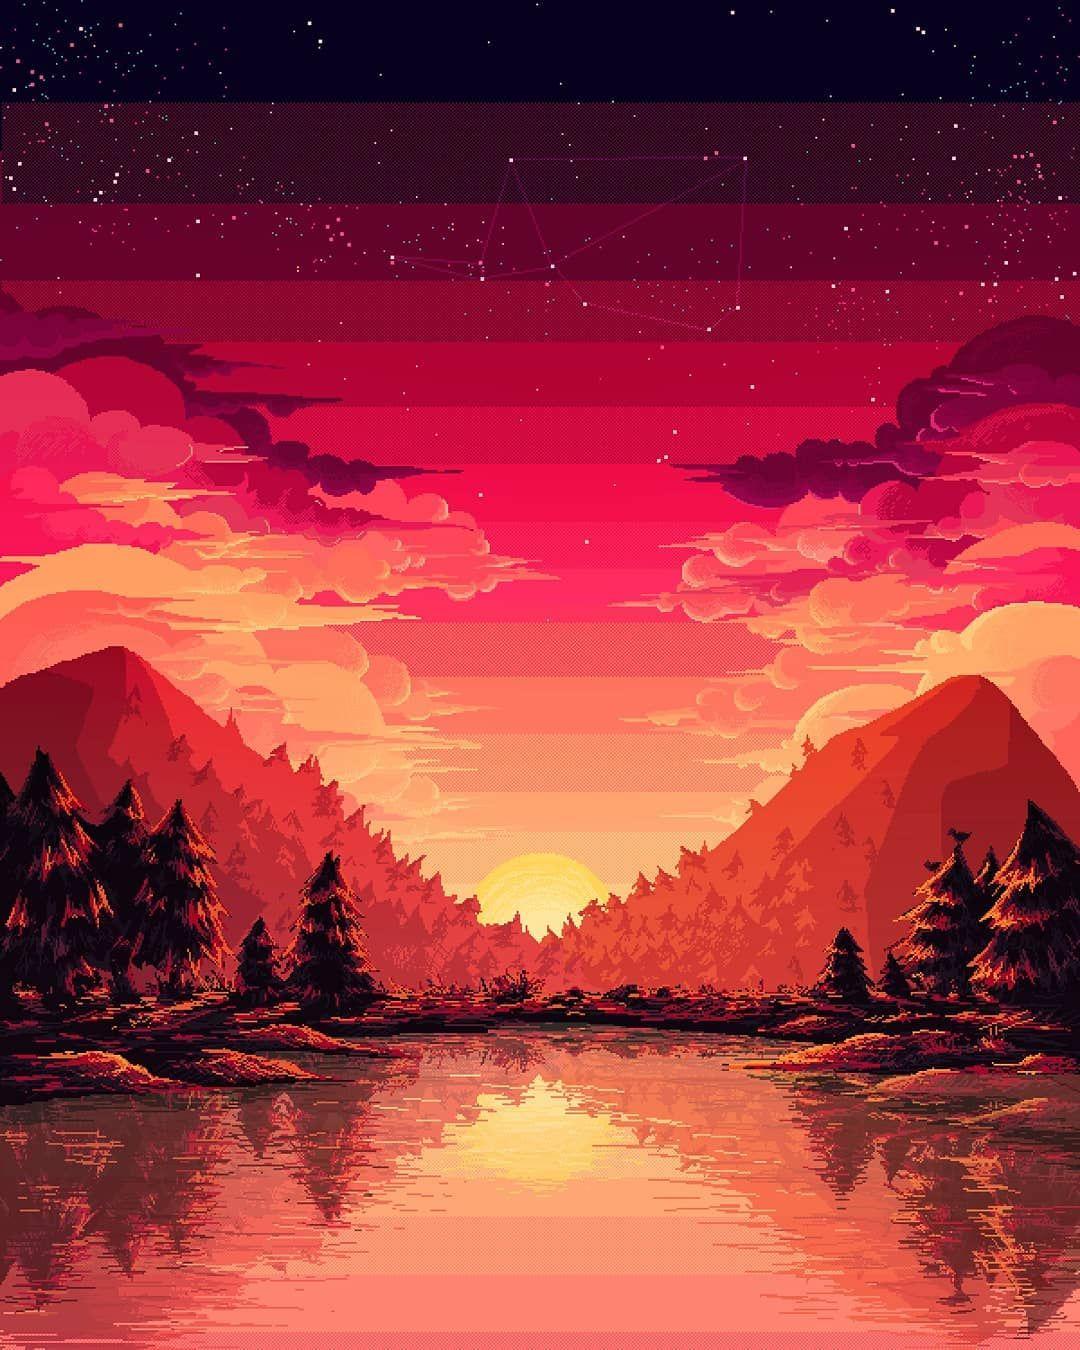 #pixelart #pixelgraphics #pixel #graphicdesign #des